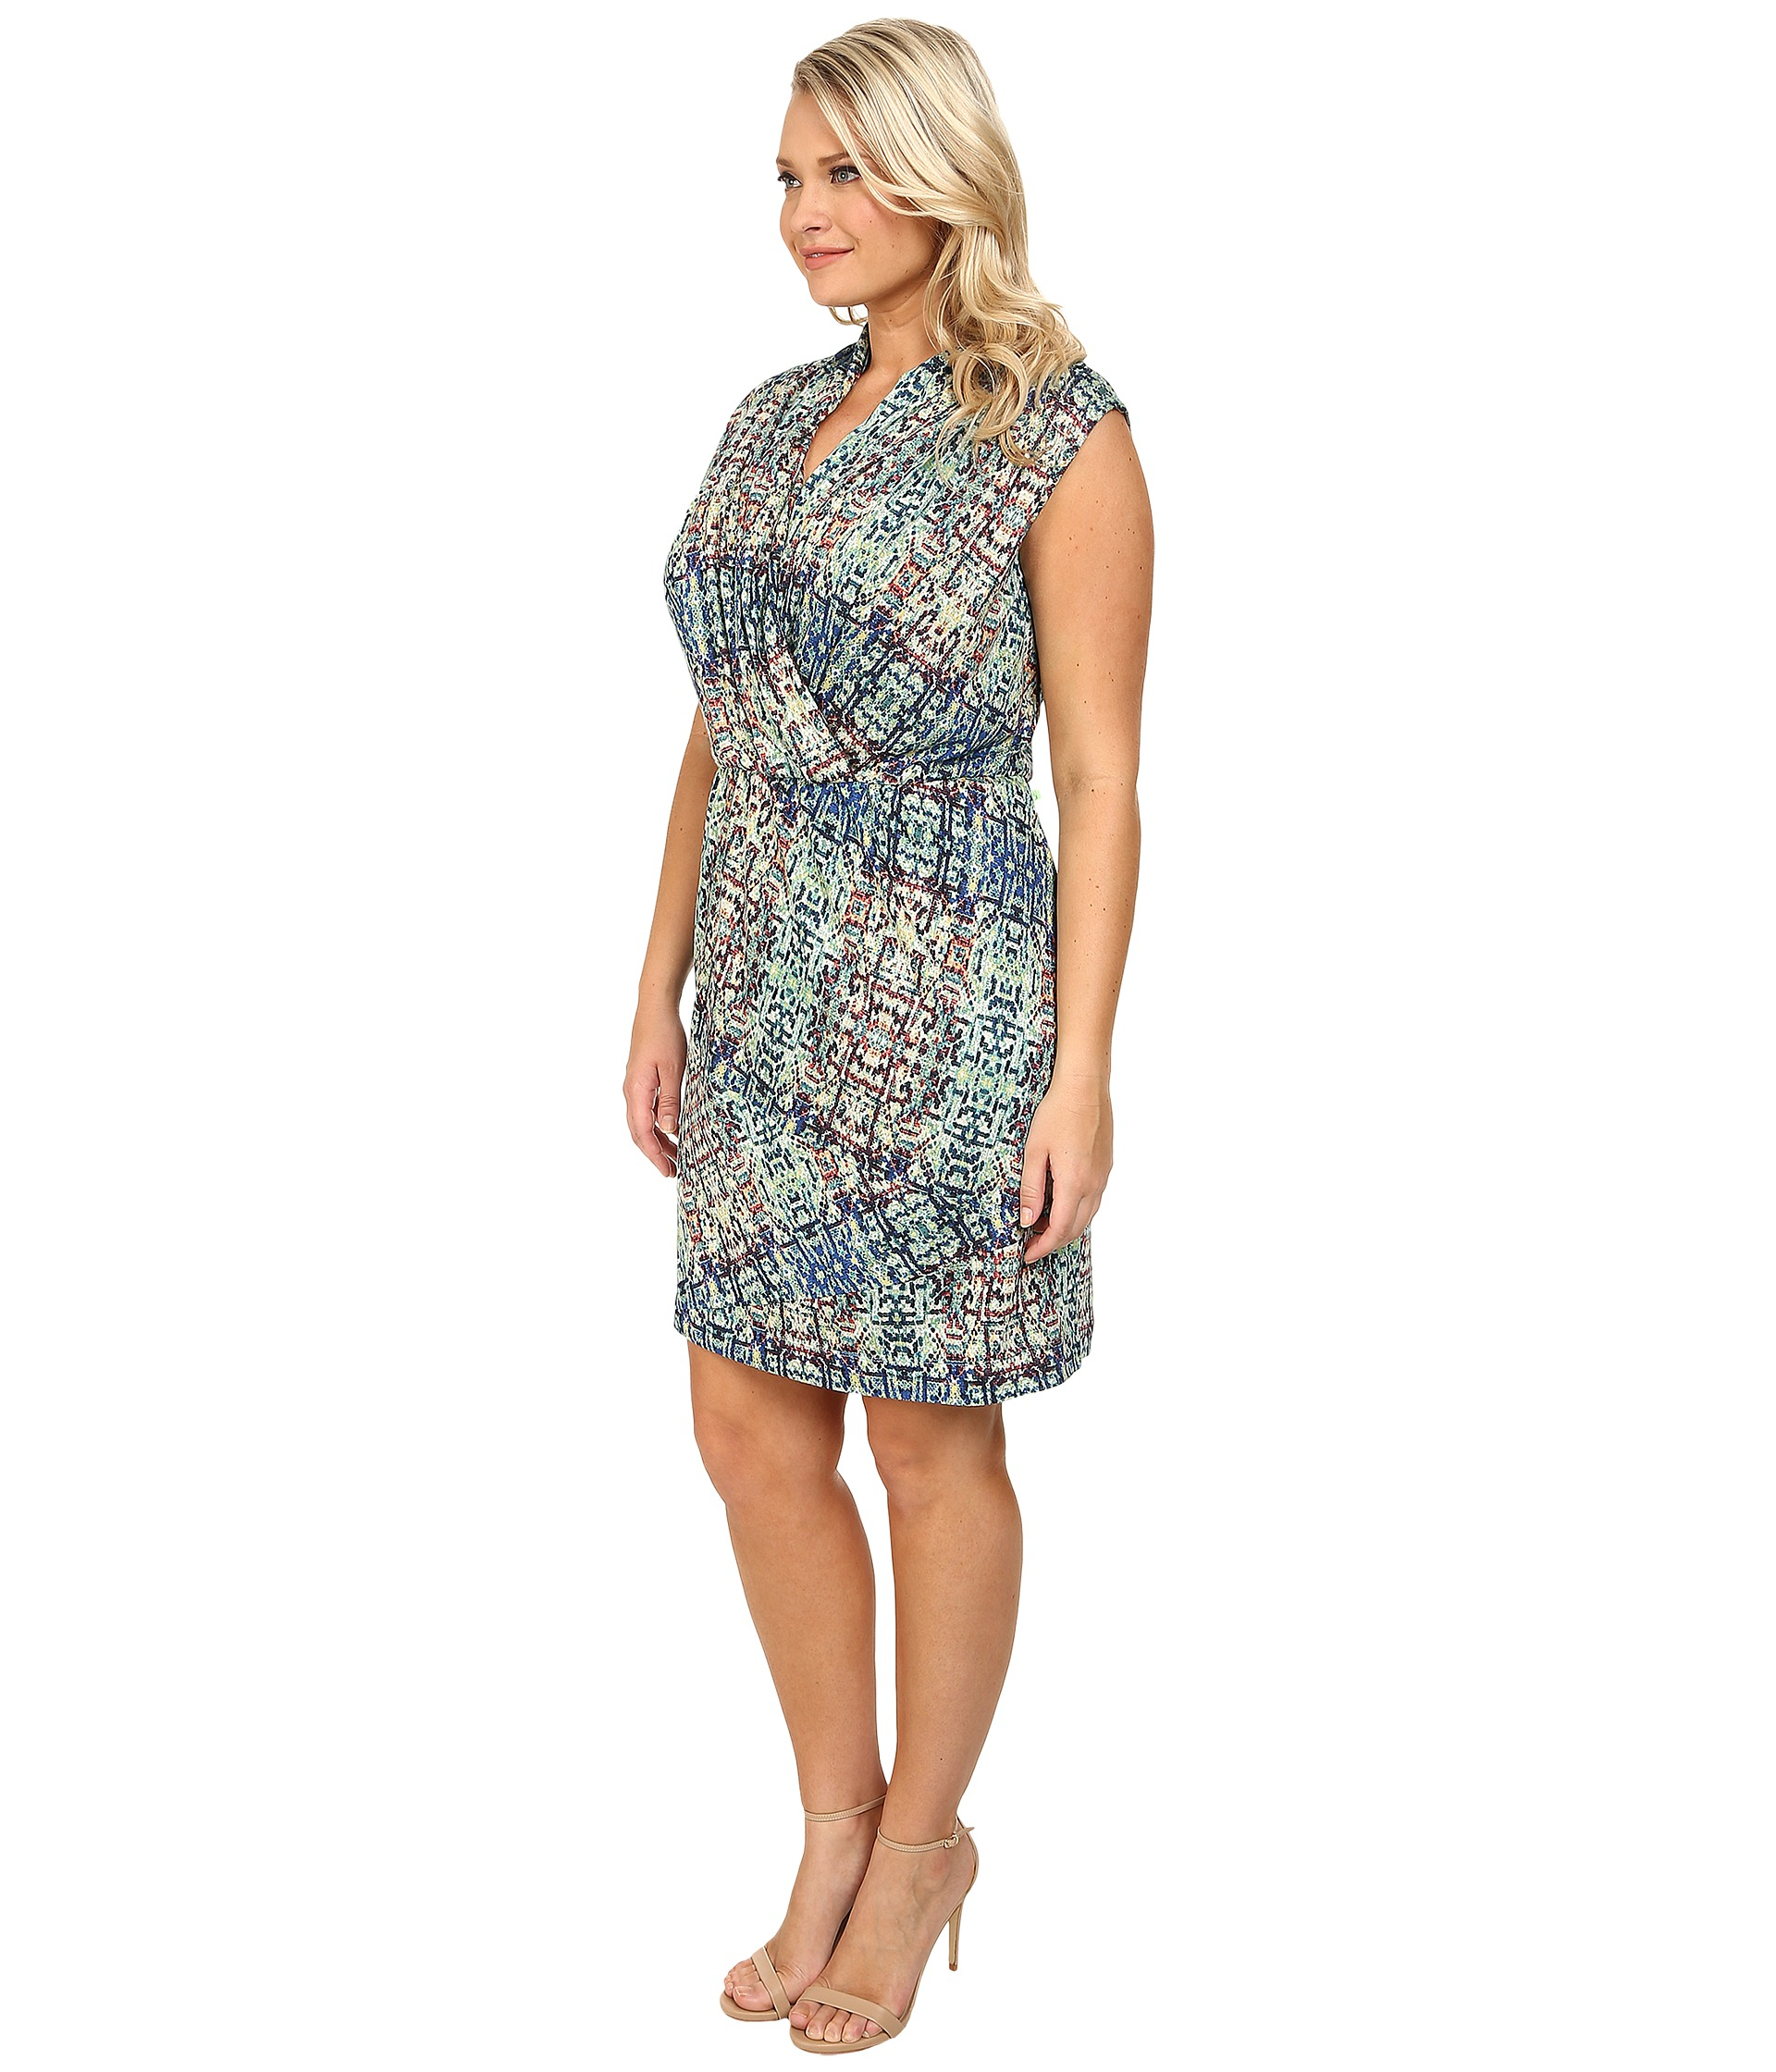 Lyst - NIC+ZOE Plus Size Urban Safari Dress